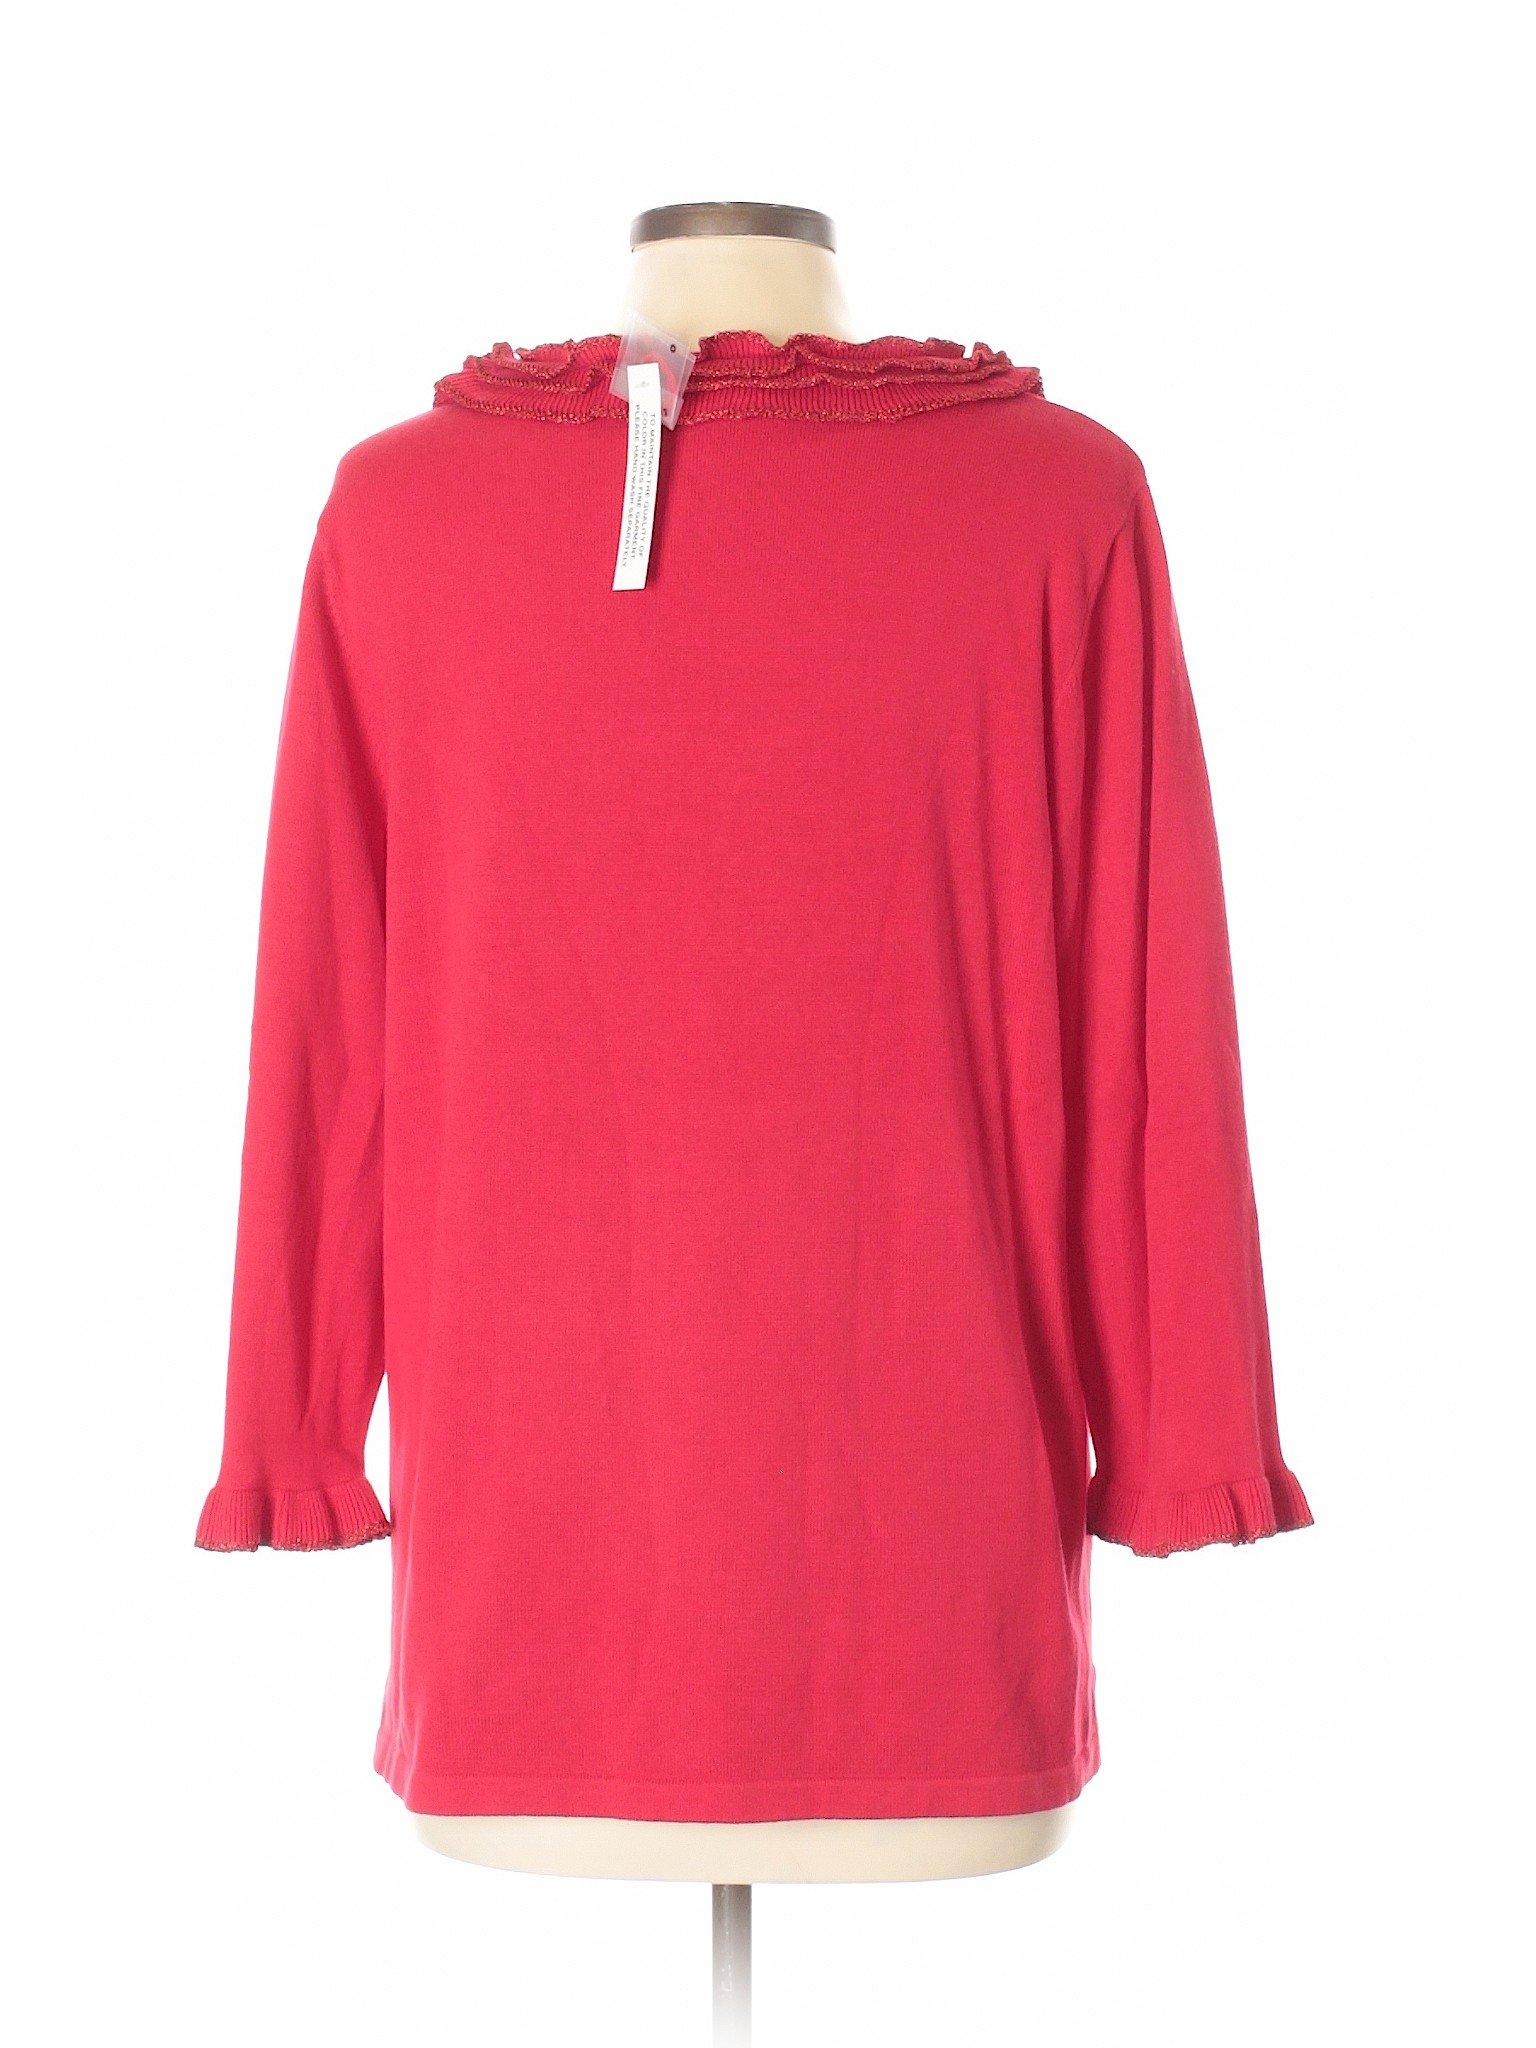 Factory Sweater Boutique Factory Boutique Quacker Pullover Quacker TqZ4SgS